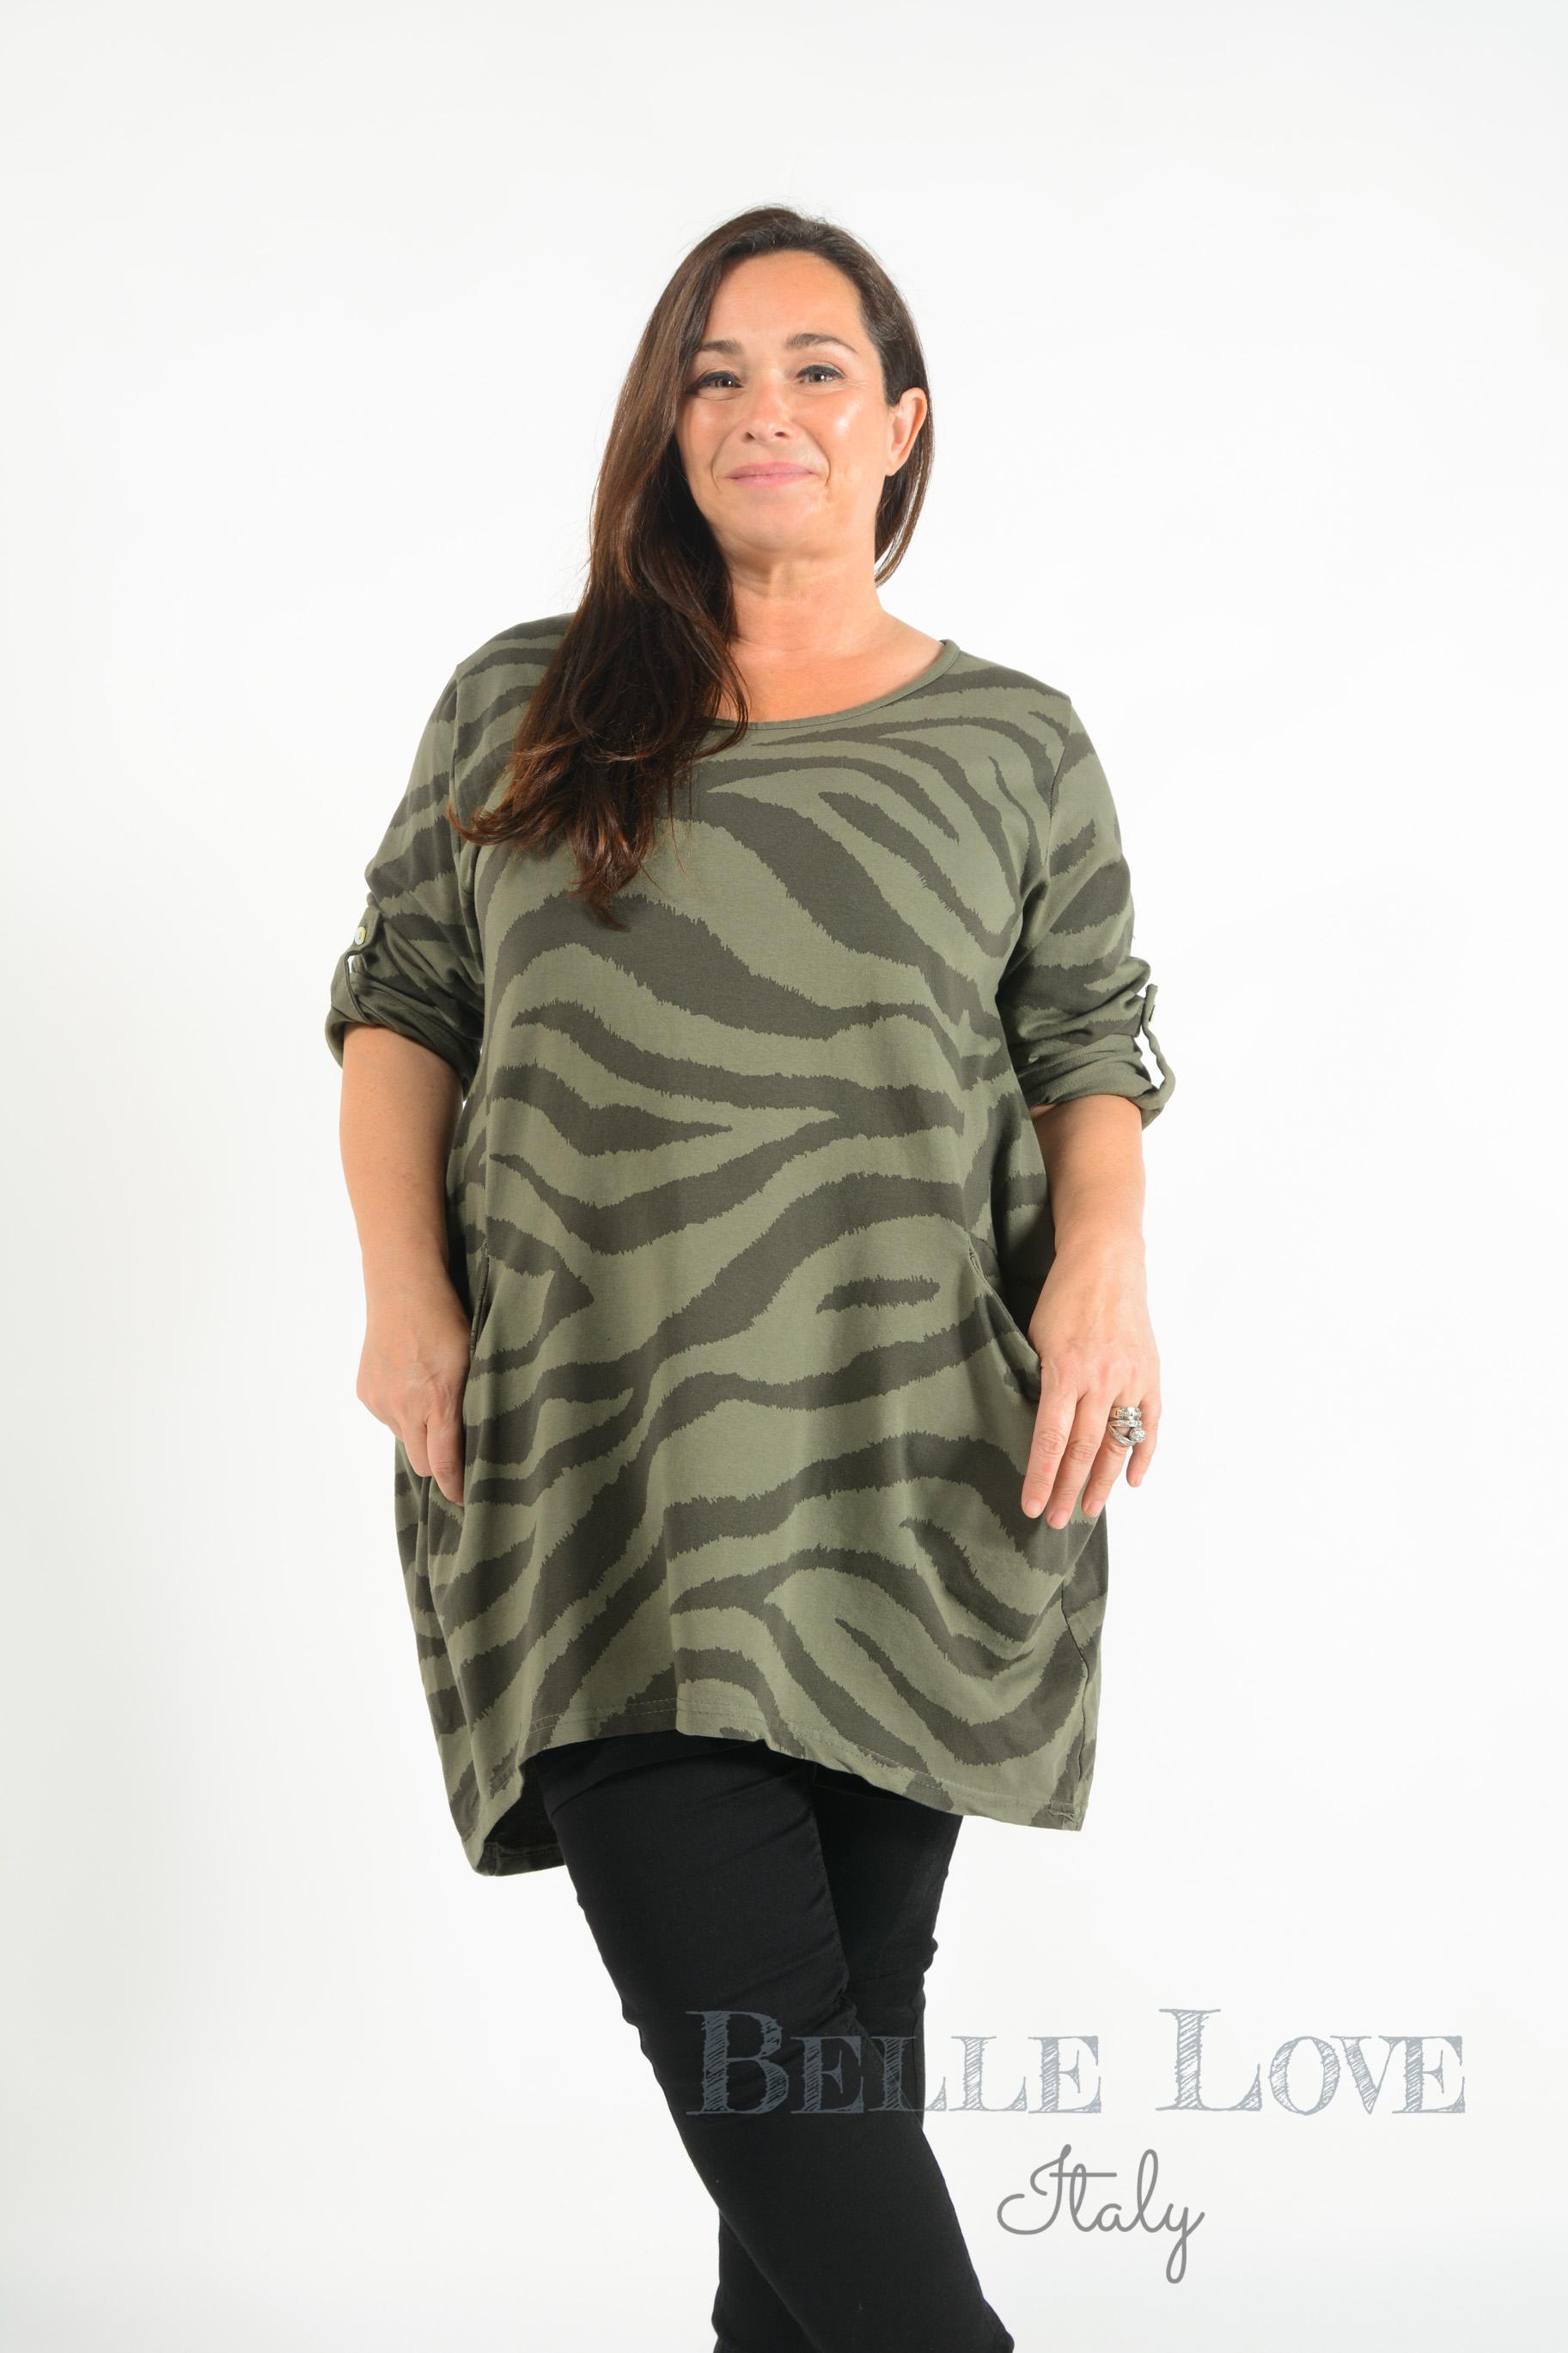 Belle Love Italy Molly Zebra Print Tunic